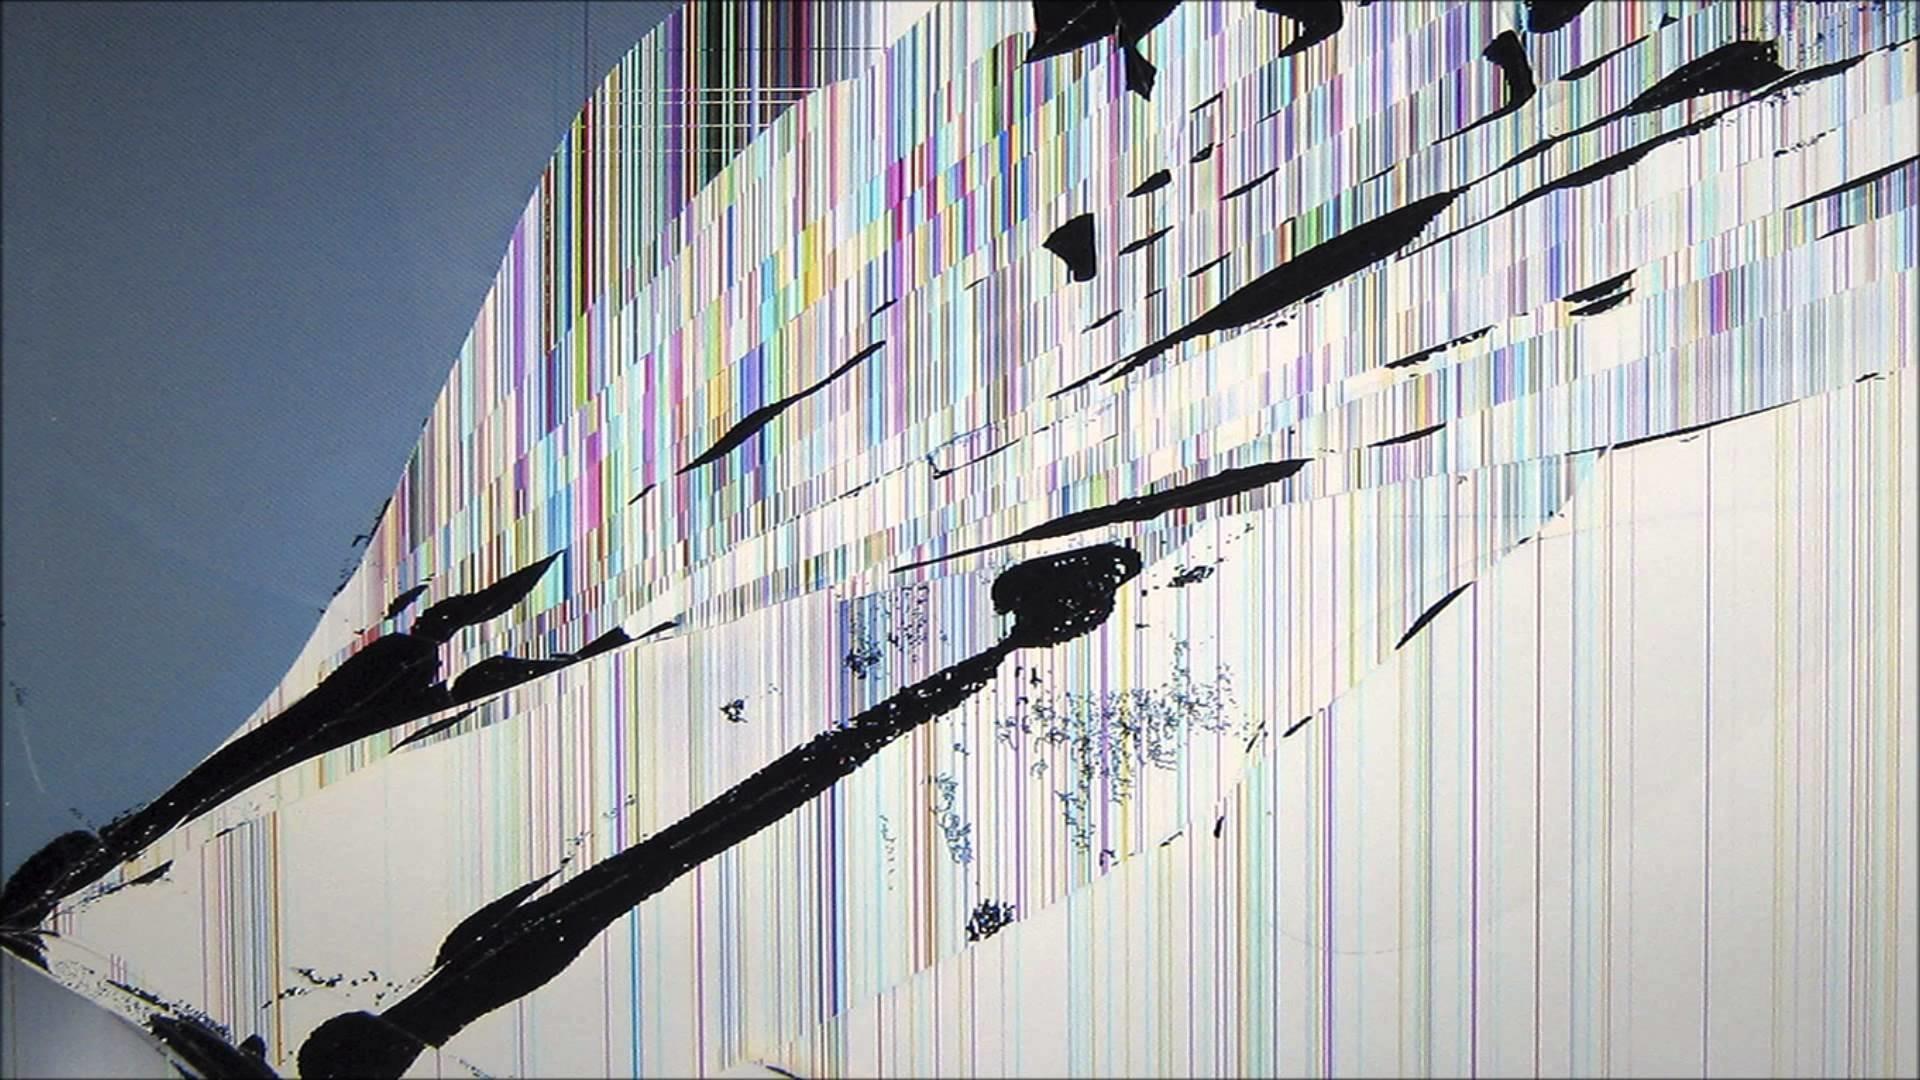 cracked screen wallpaper tablet